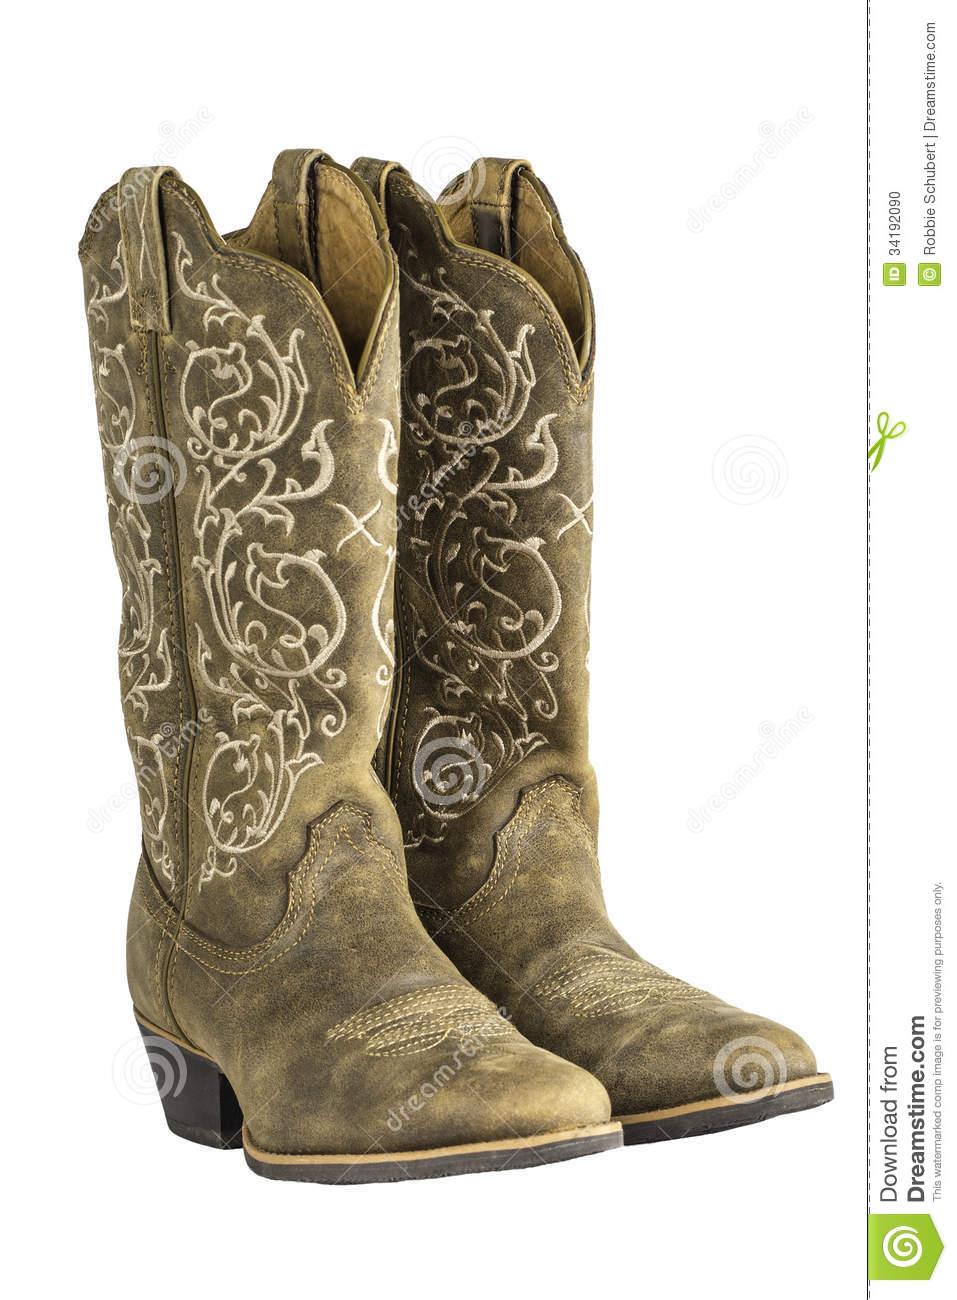 45 Cowboy Boots Wallpaper On Wallpapersafari